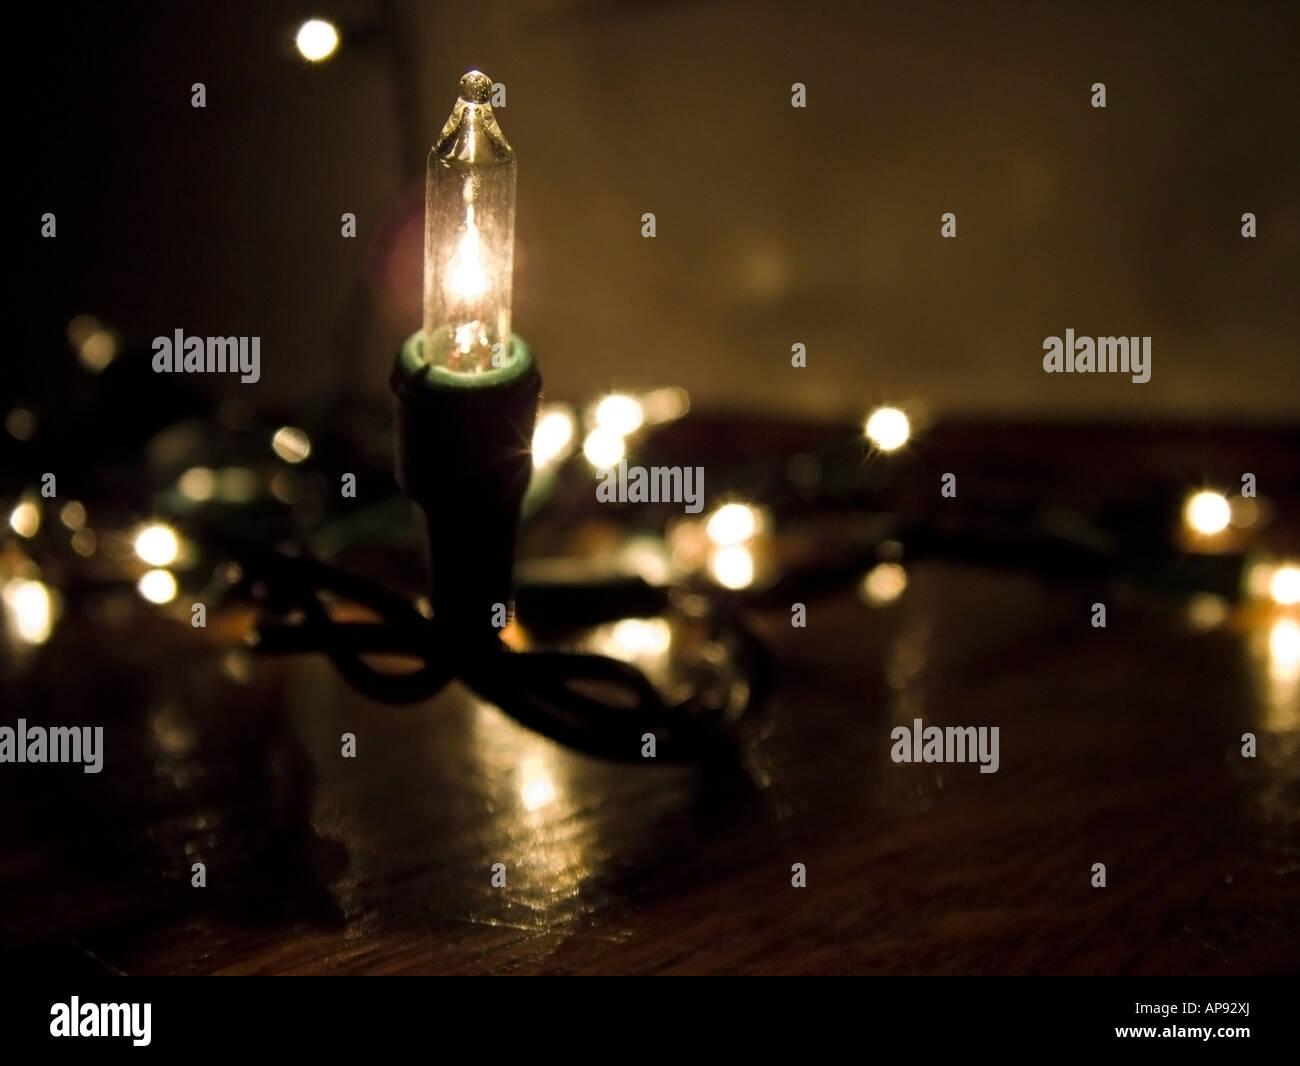 White String Christmas Lights.String Of White Christmas Lights On A Wood Floor Stock Photo